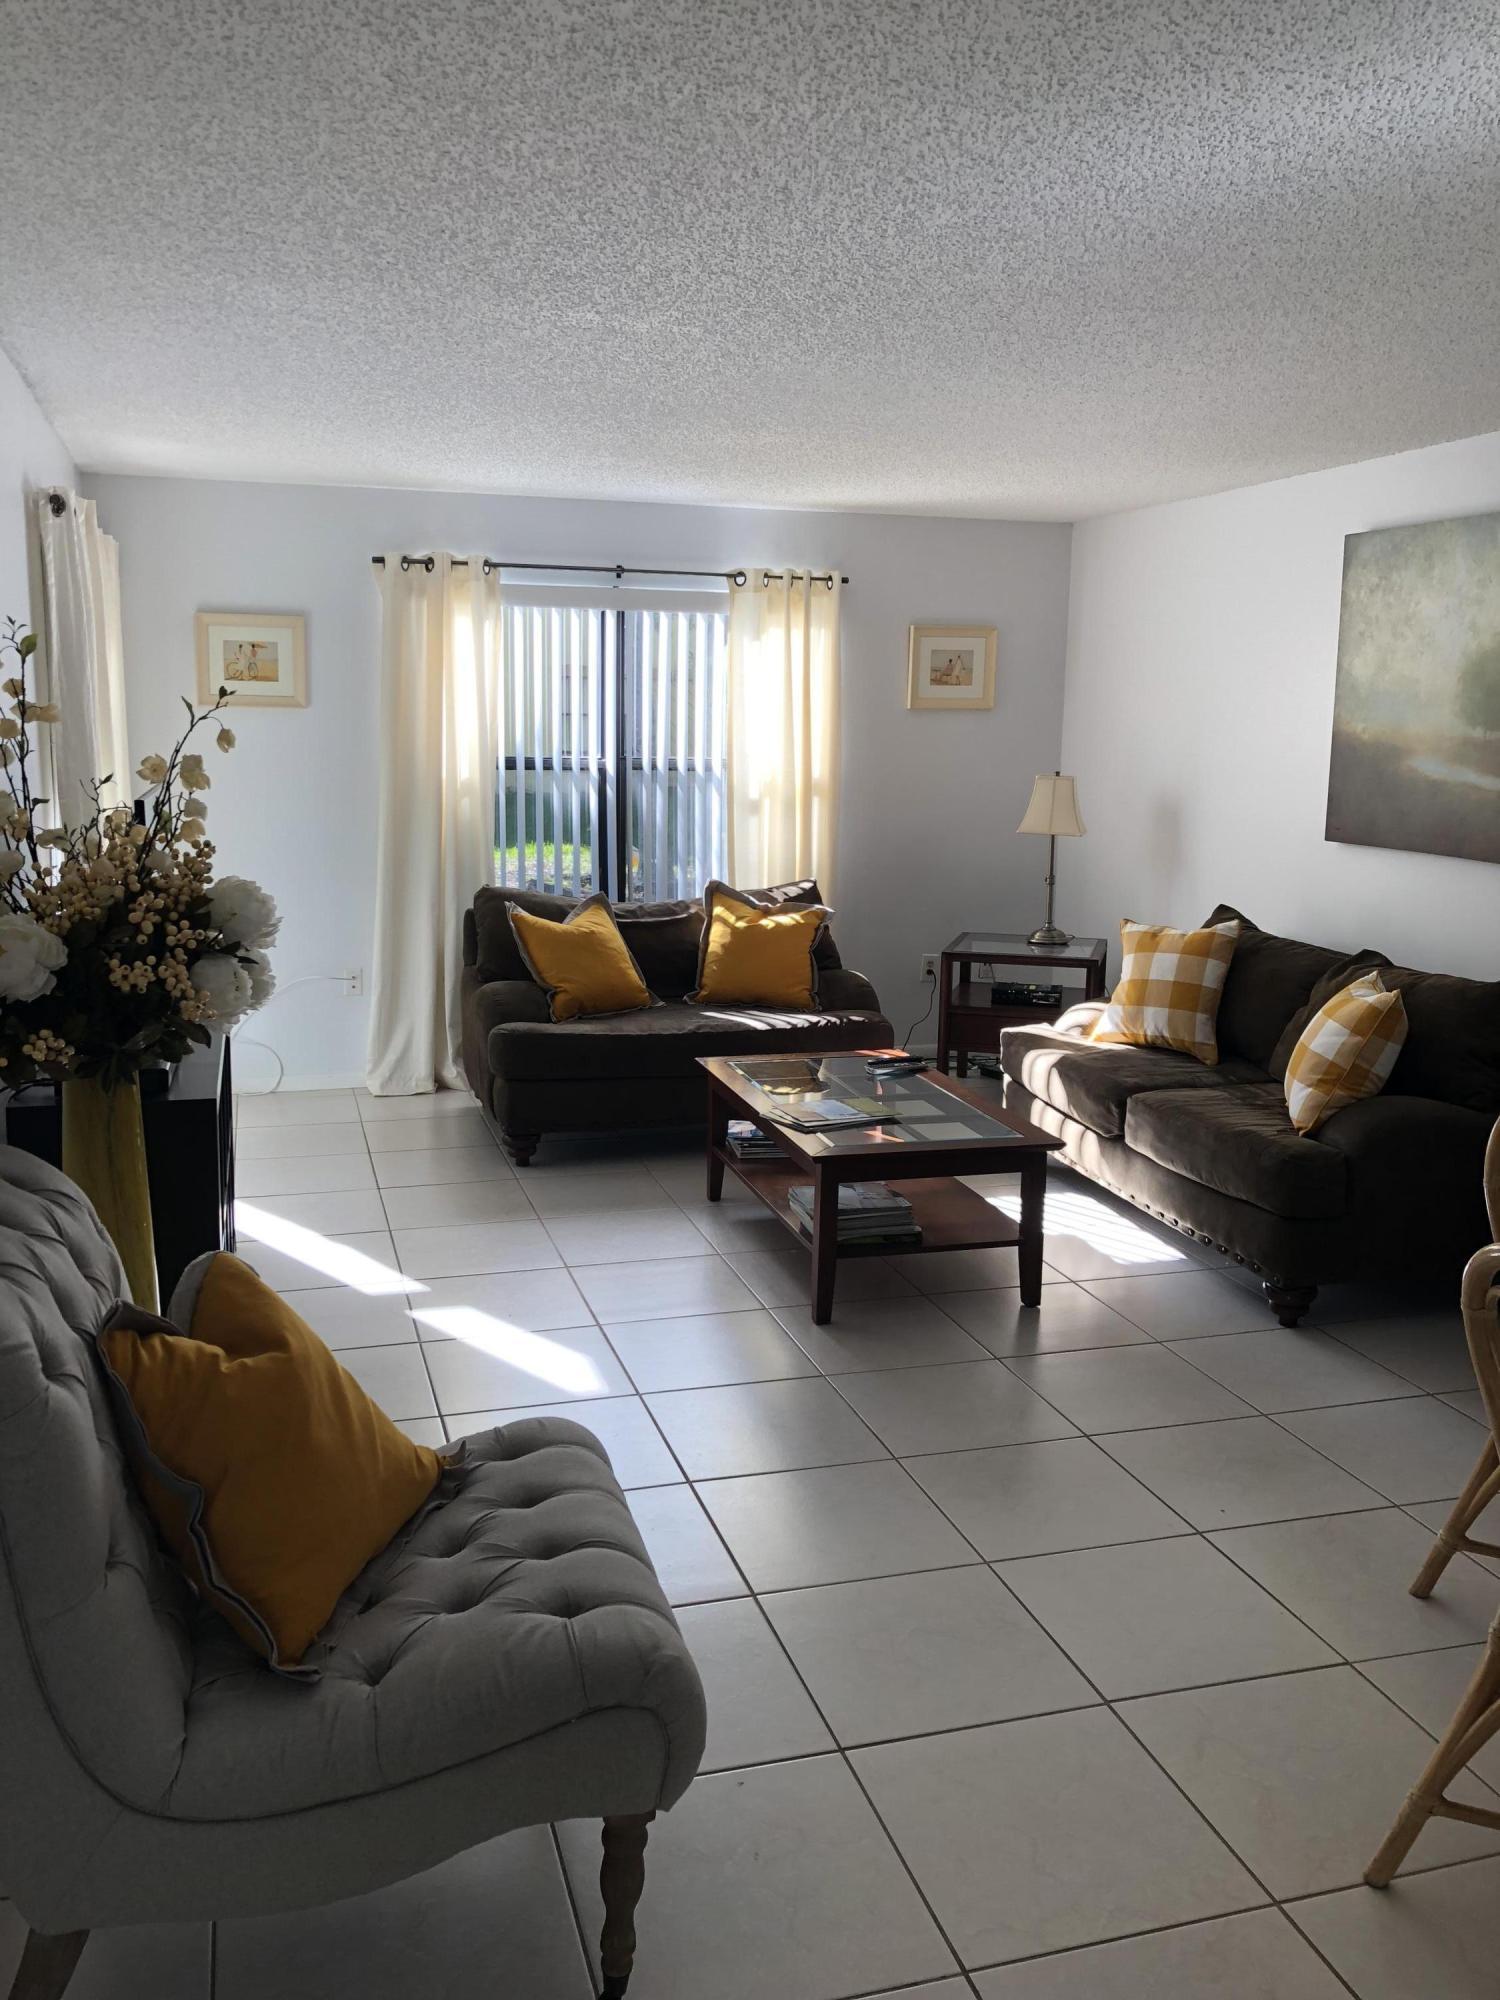 13175 Chadwick Court, Wellington, Florida 33414, 2 Bedrooms Bedrooms, ,2 BathroomsBathrooms,Condo/Coop,For Rent,Chadwick,1,RX-10550261